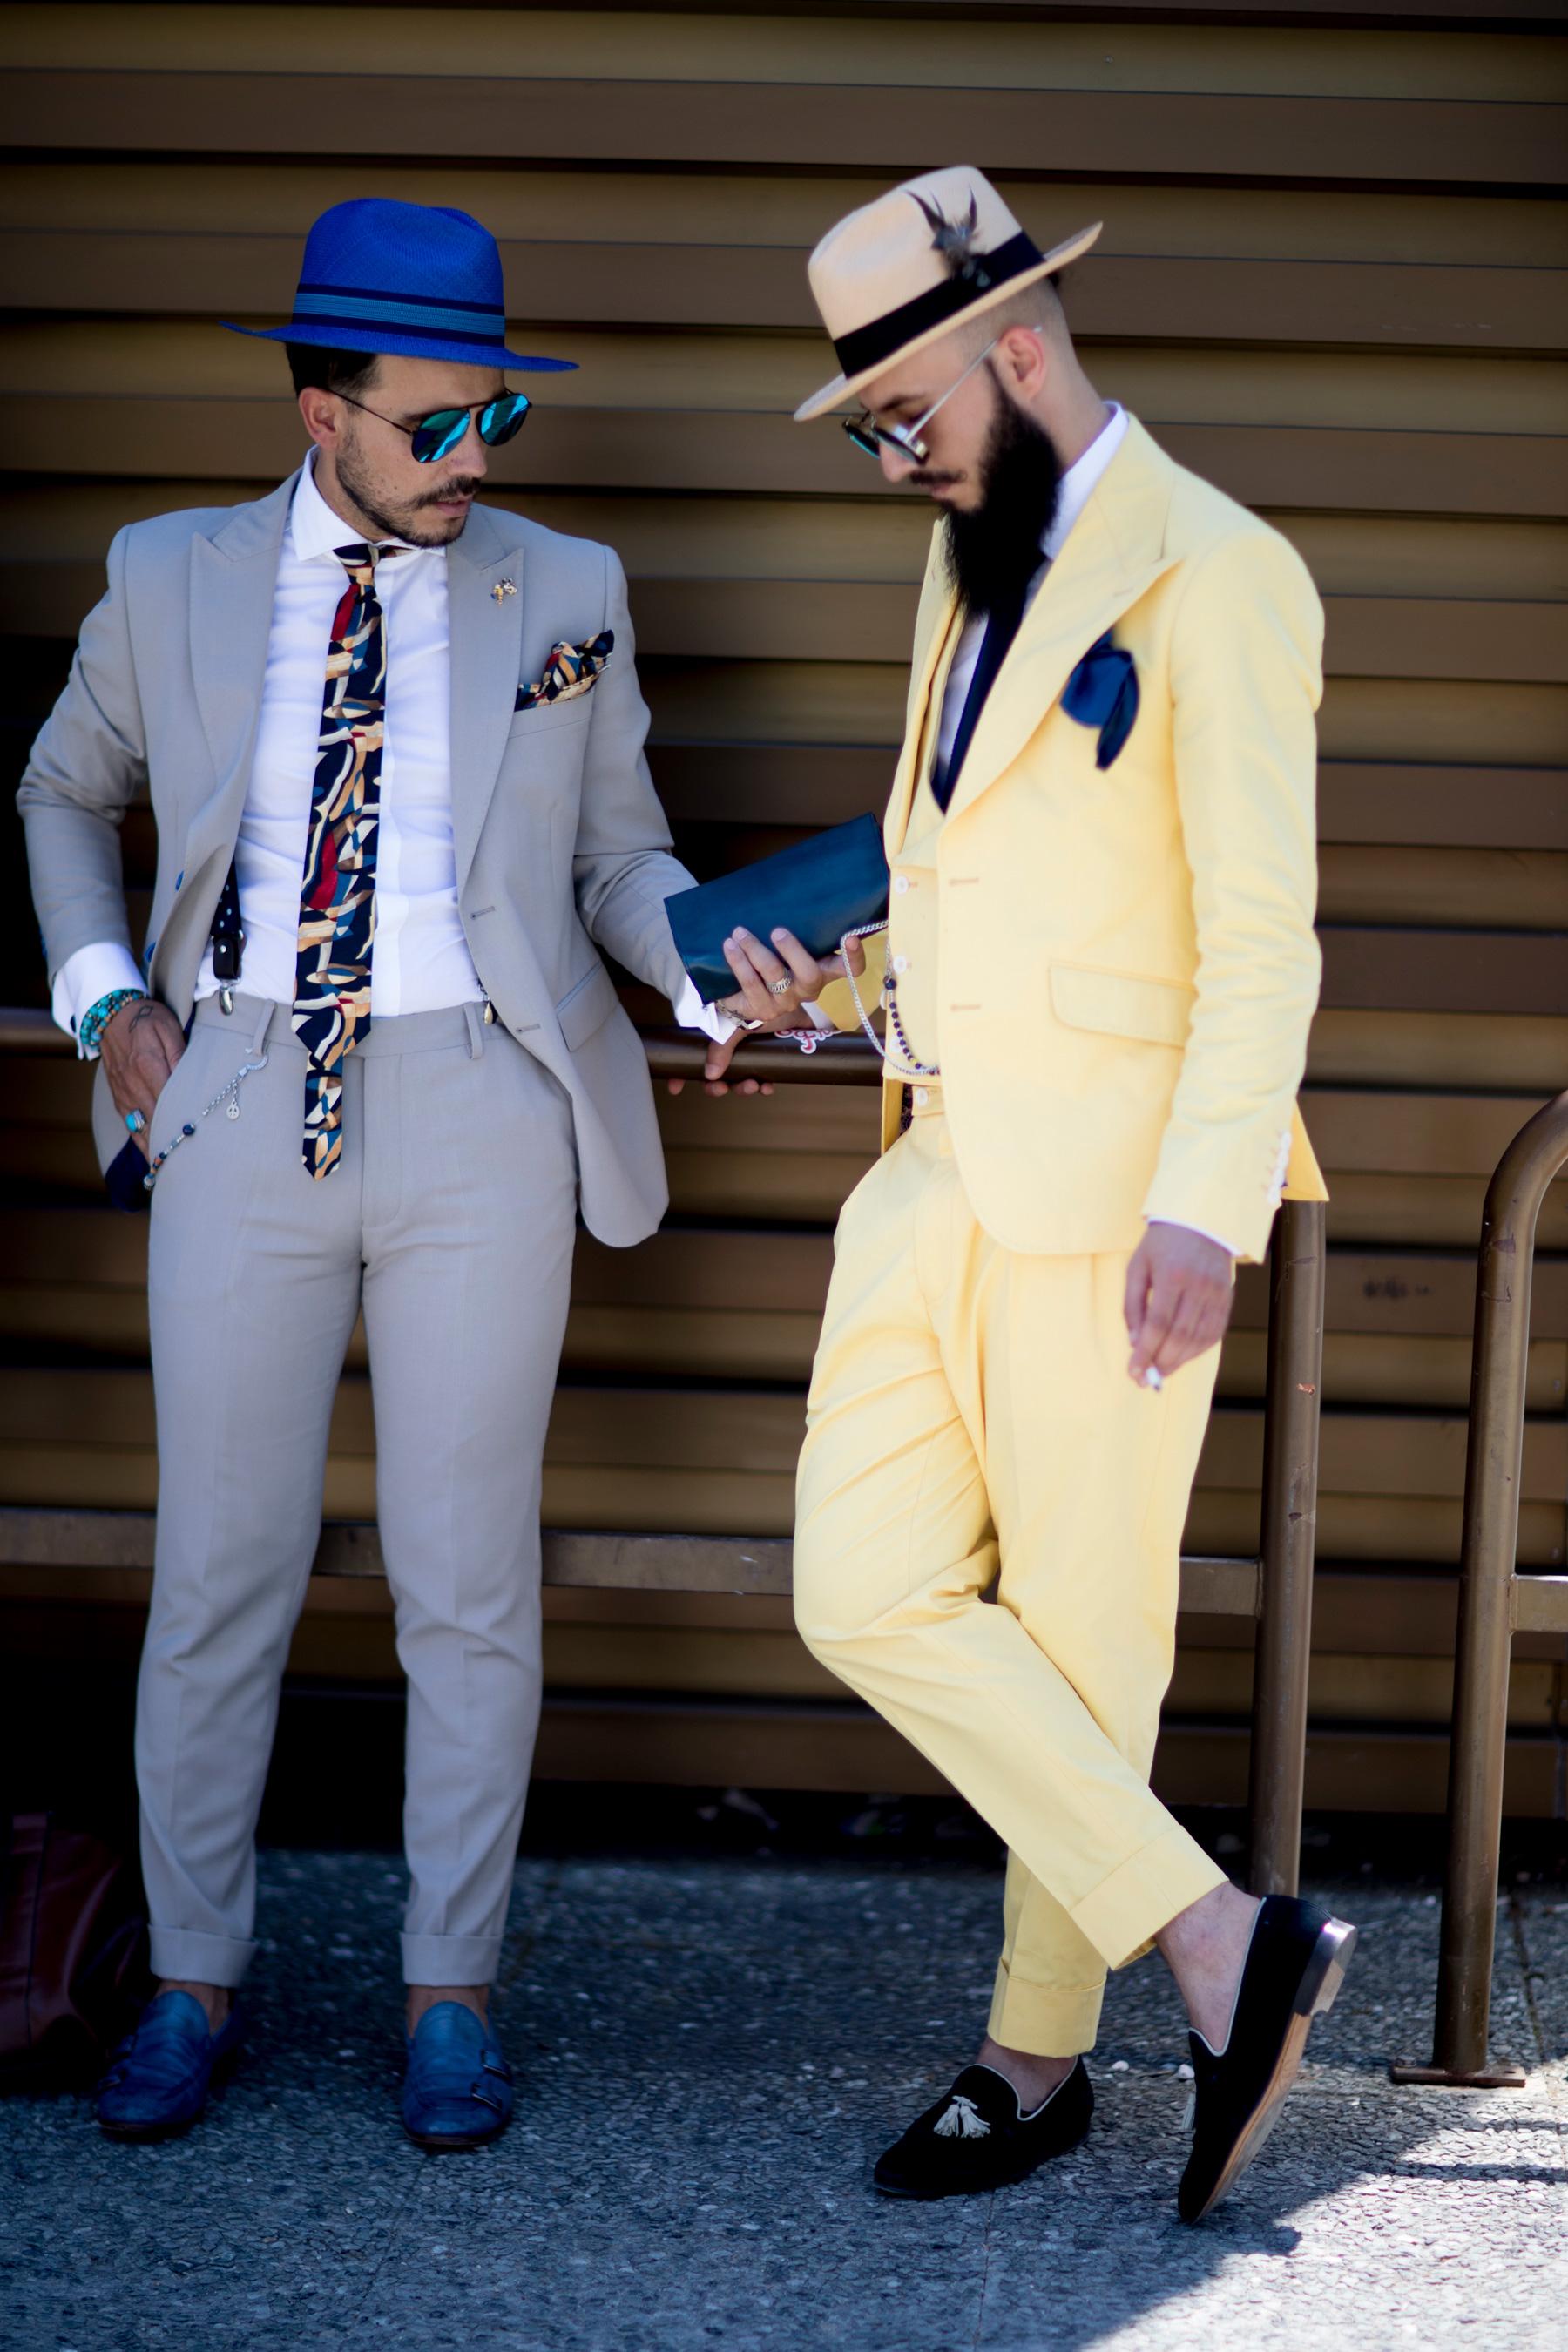 Firenze Pitti Uomo Fashion Week Men's Street Style Spring 2018 Day 1